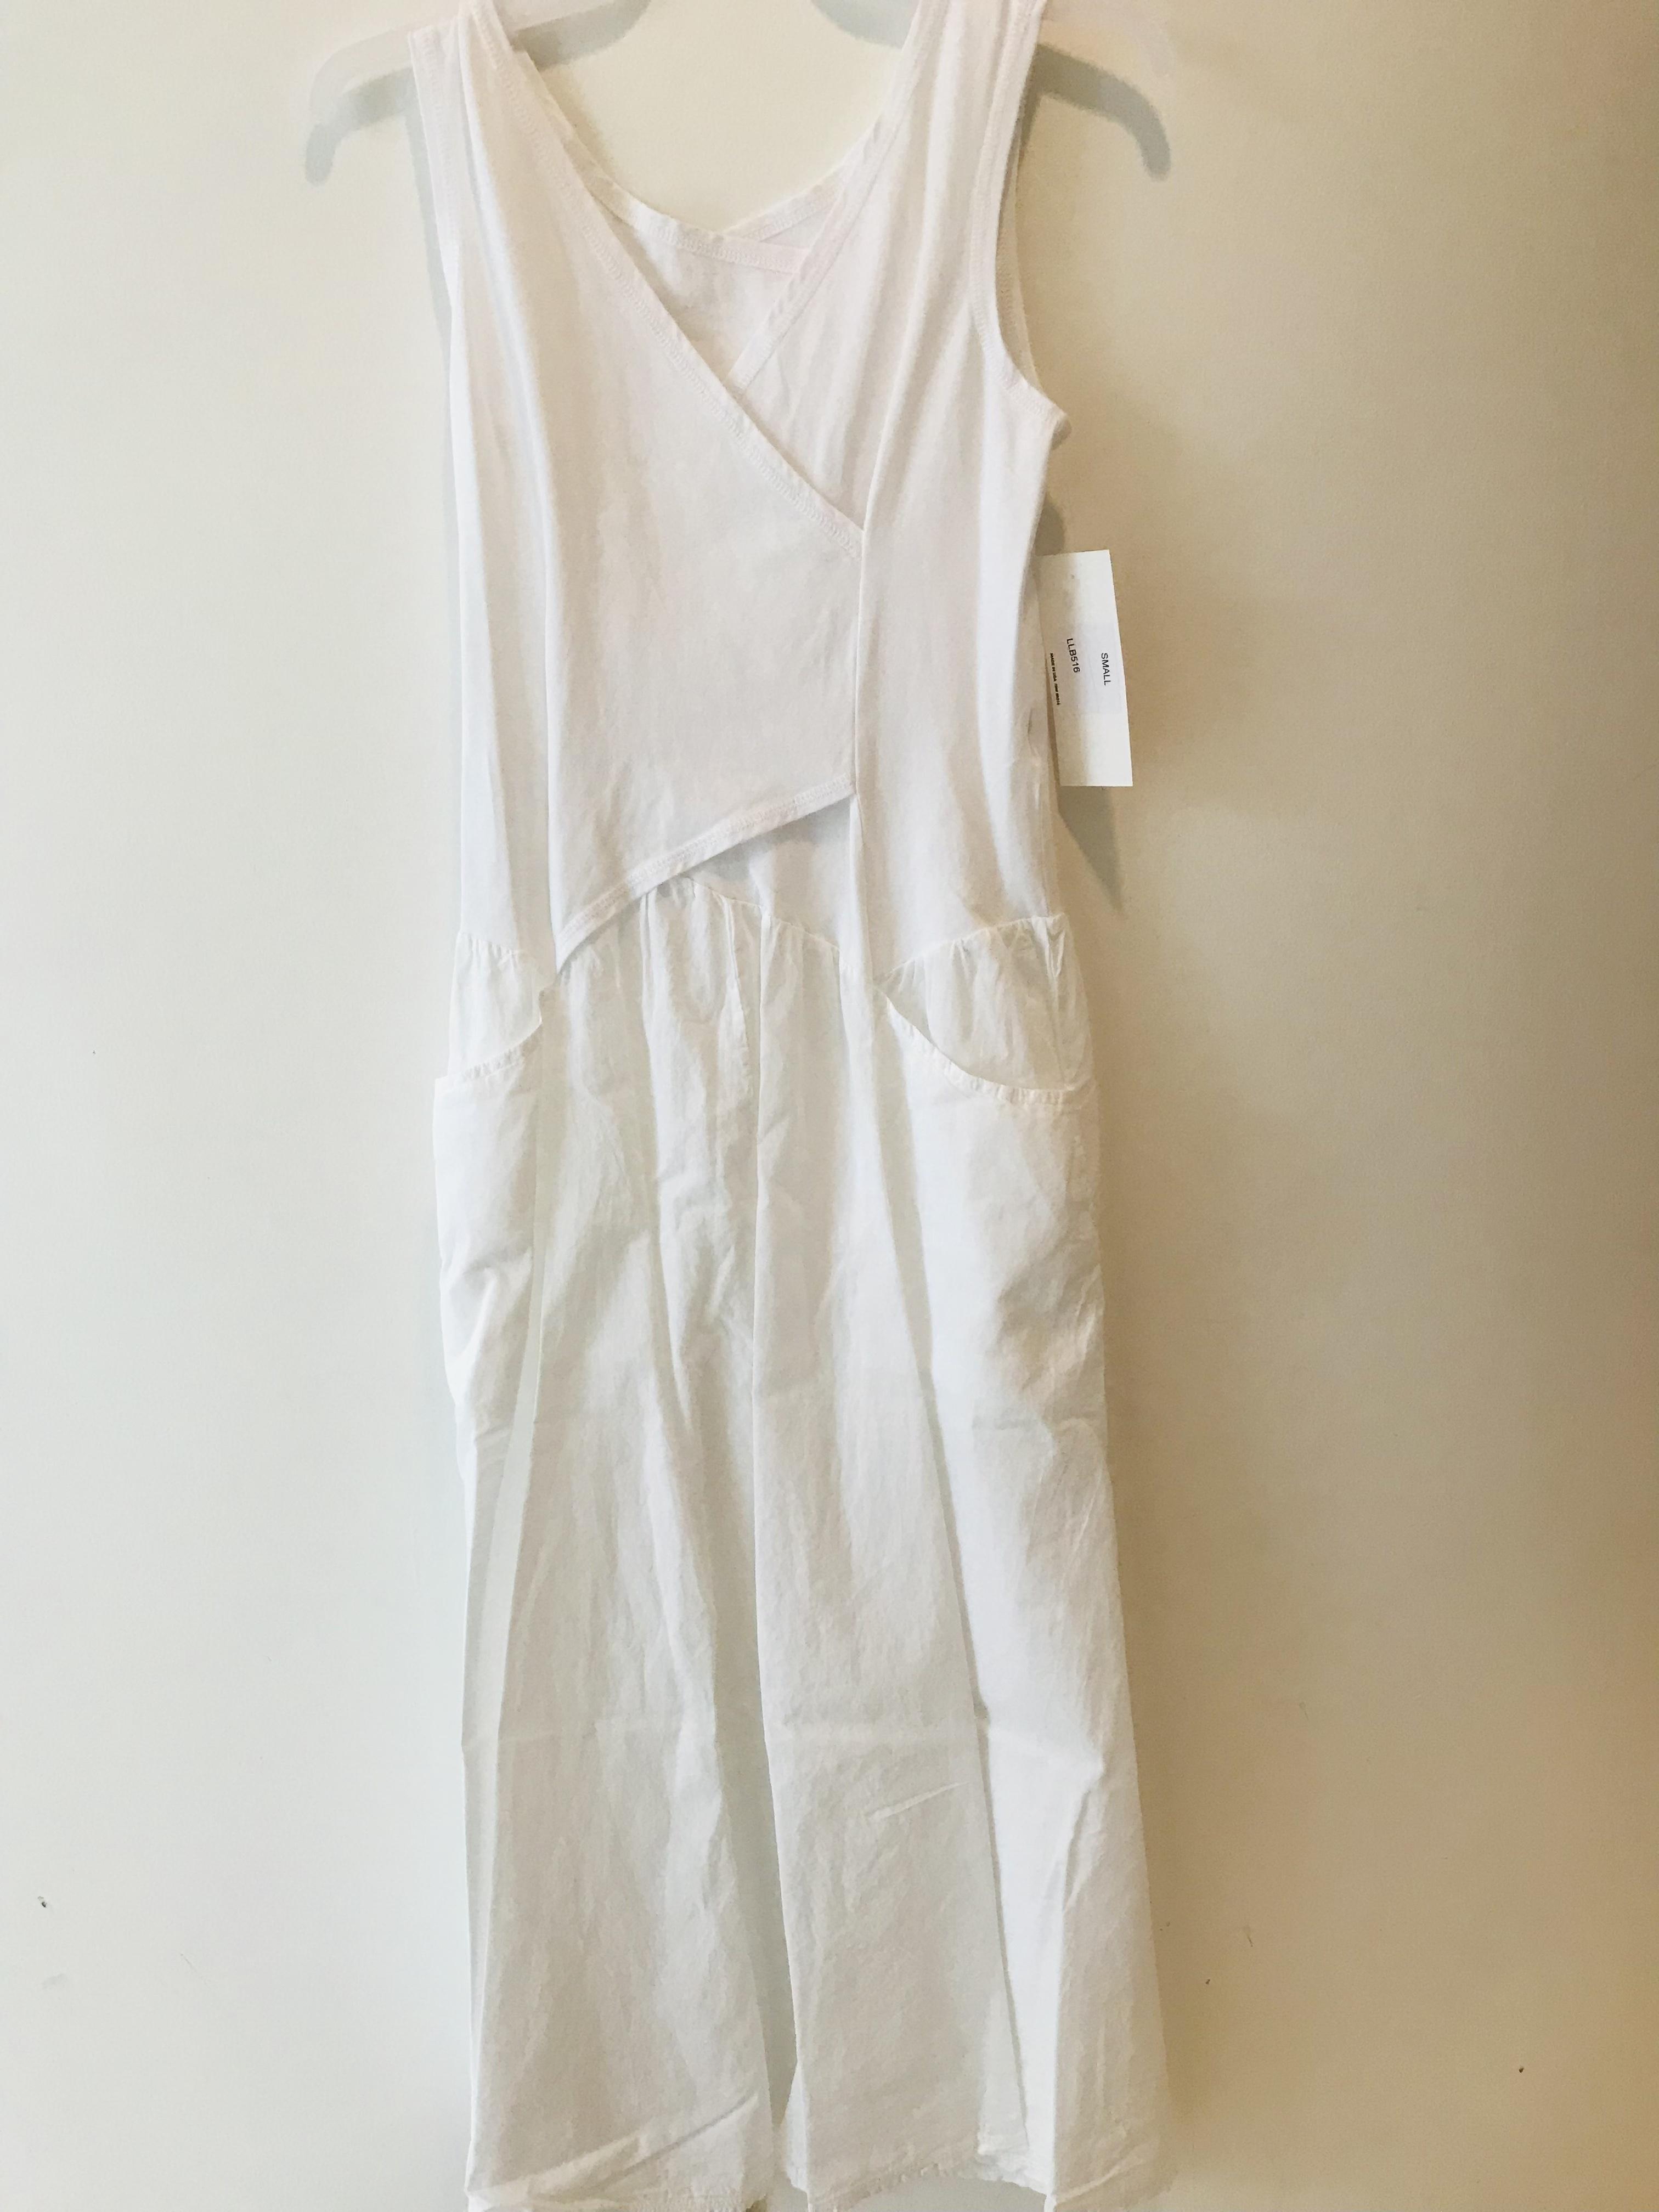 Luna Luz: Cross Over Bodice Maxi Dress (Ships Immed in White, 2 Left!)